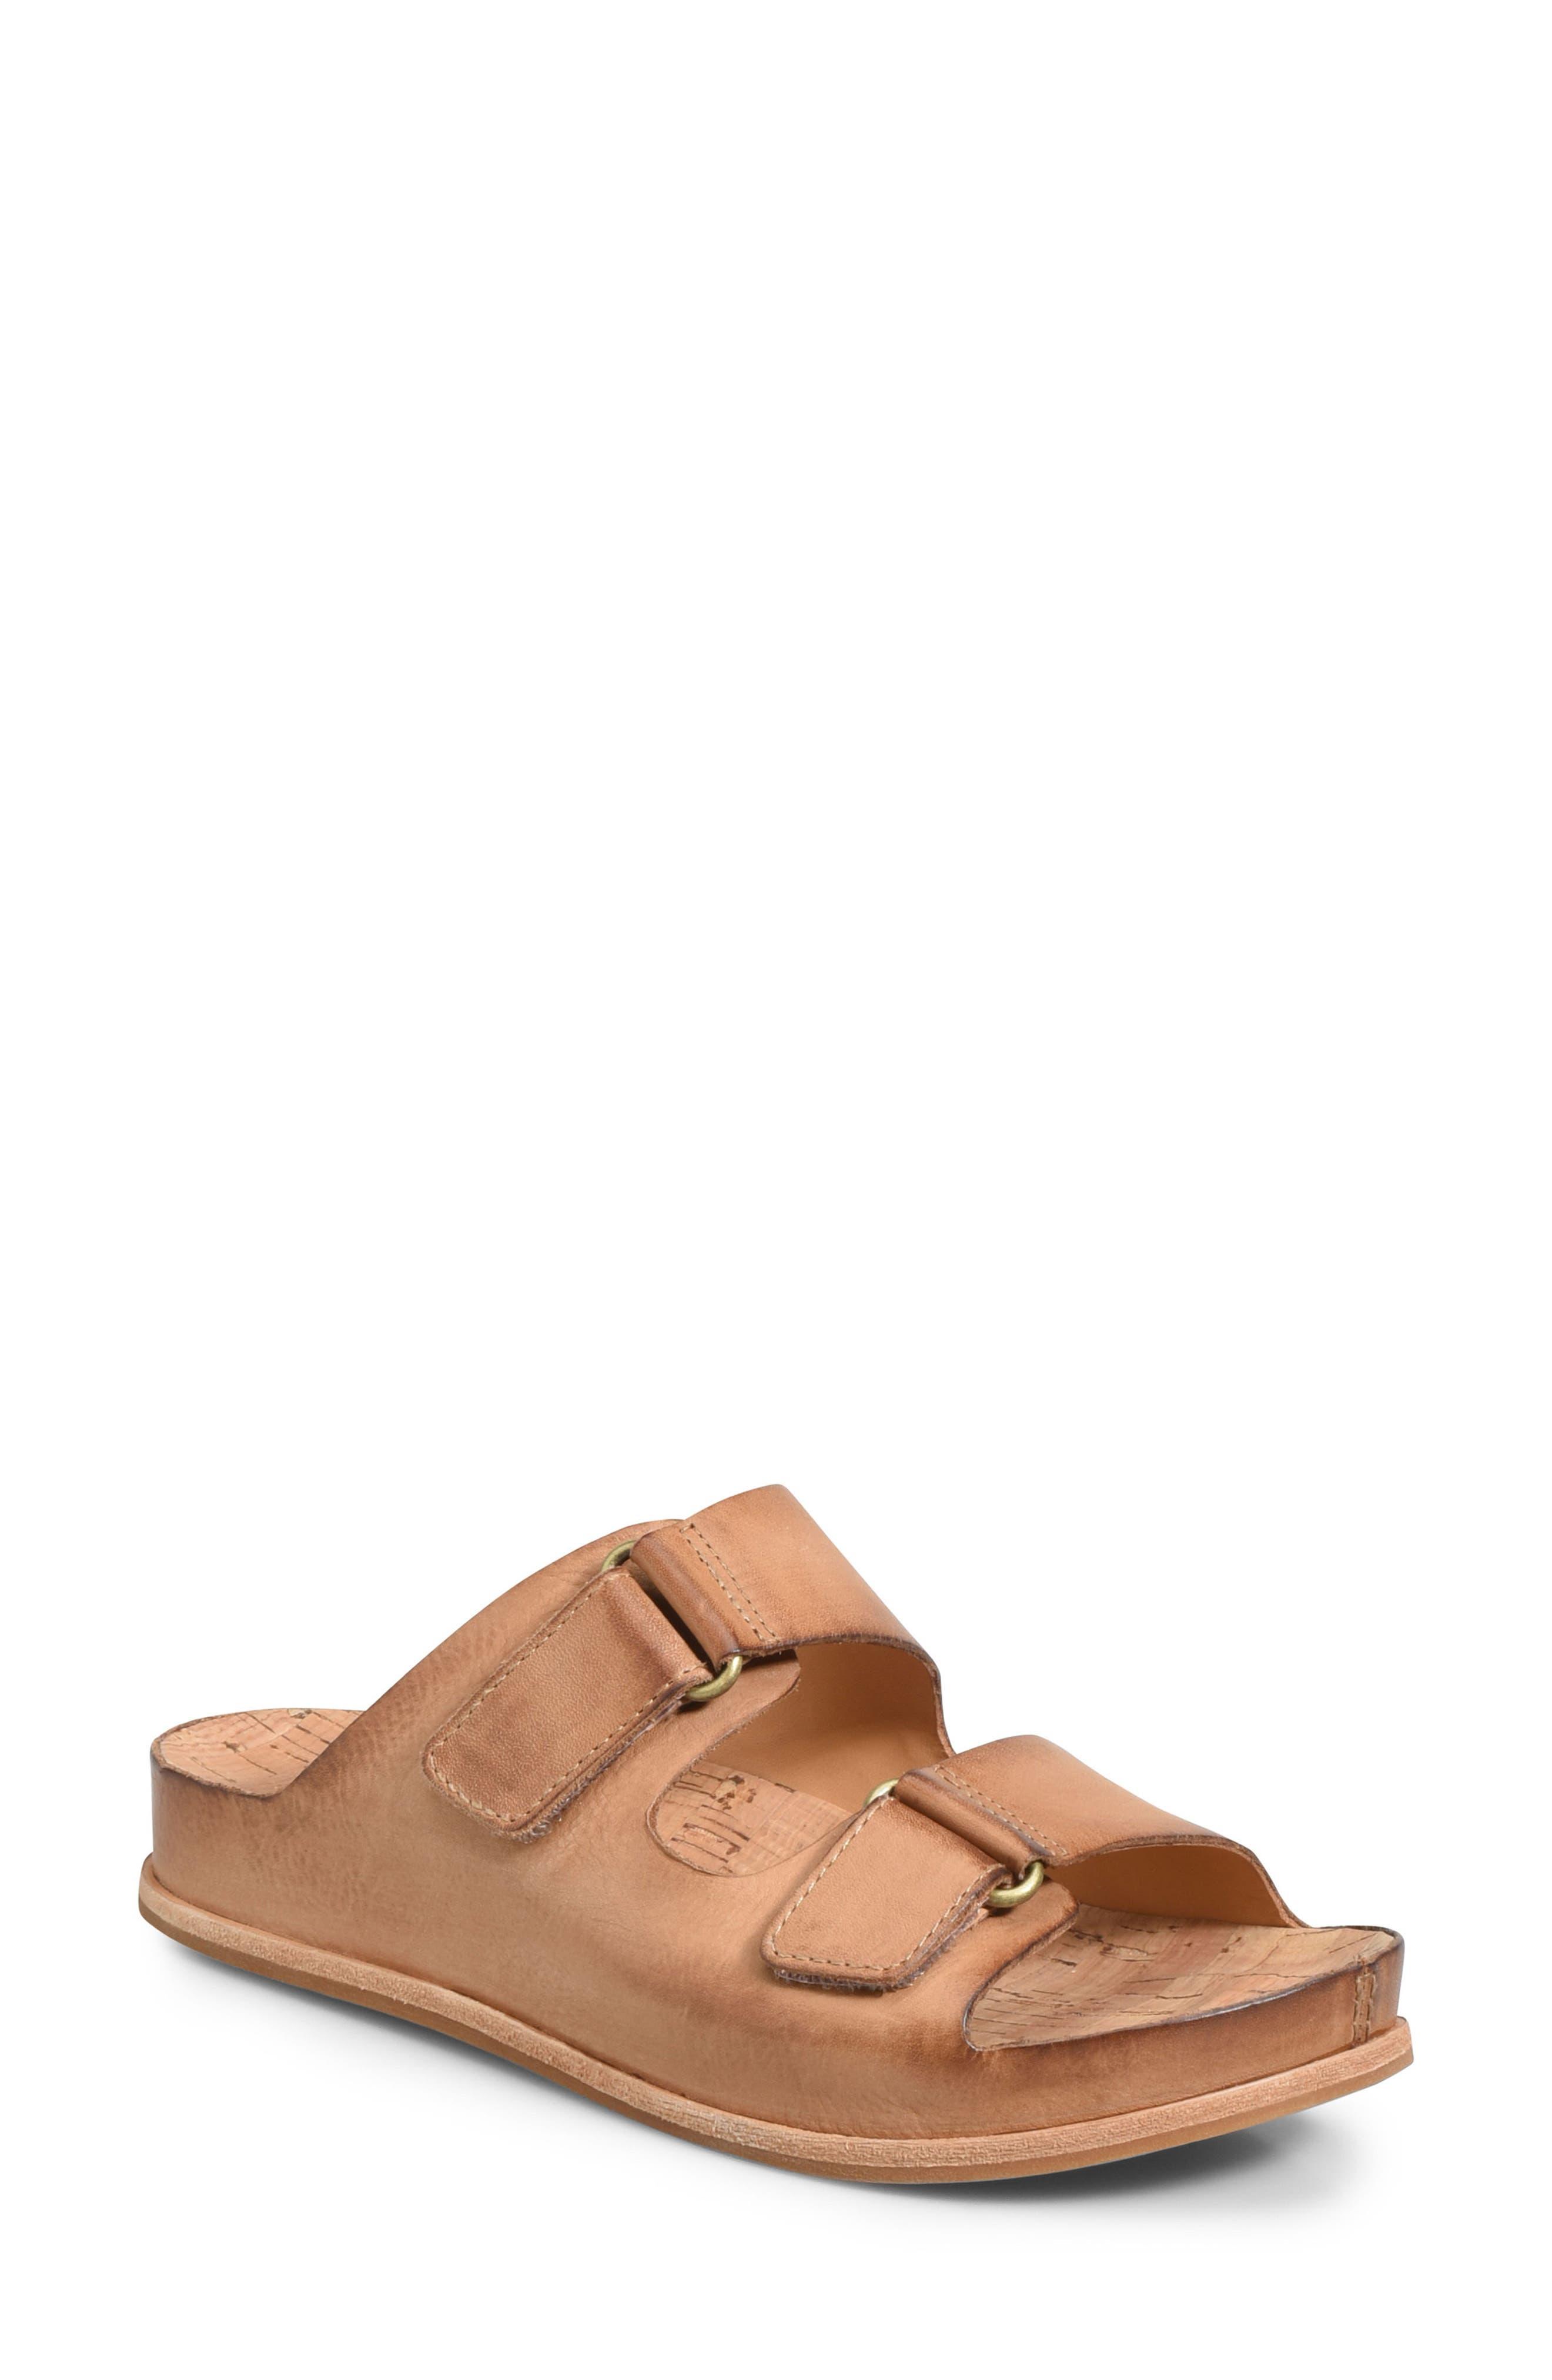 Kork-Ease Torreya Slide Sandal, Brown